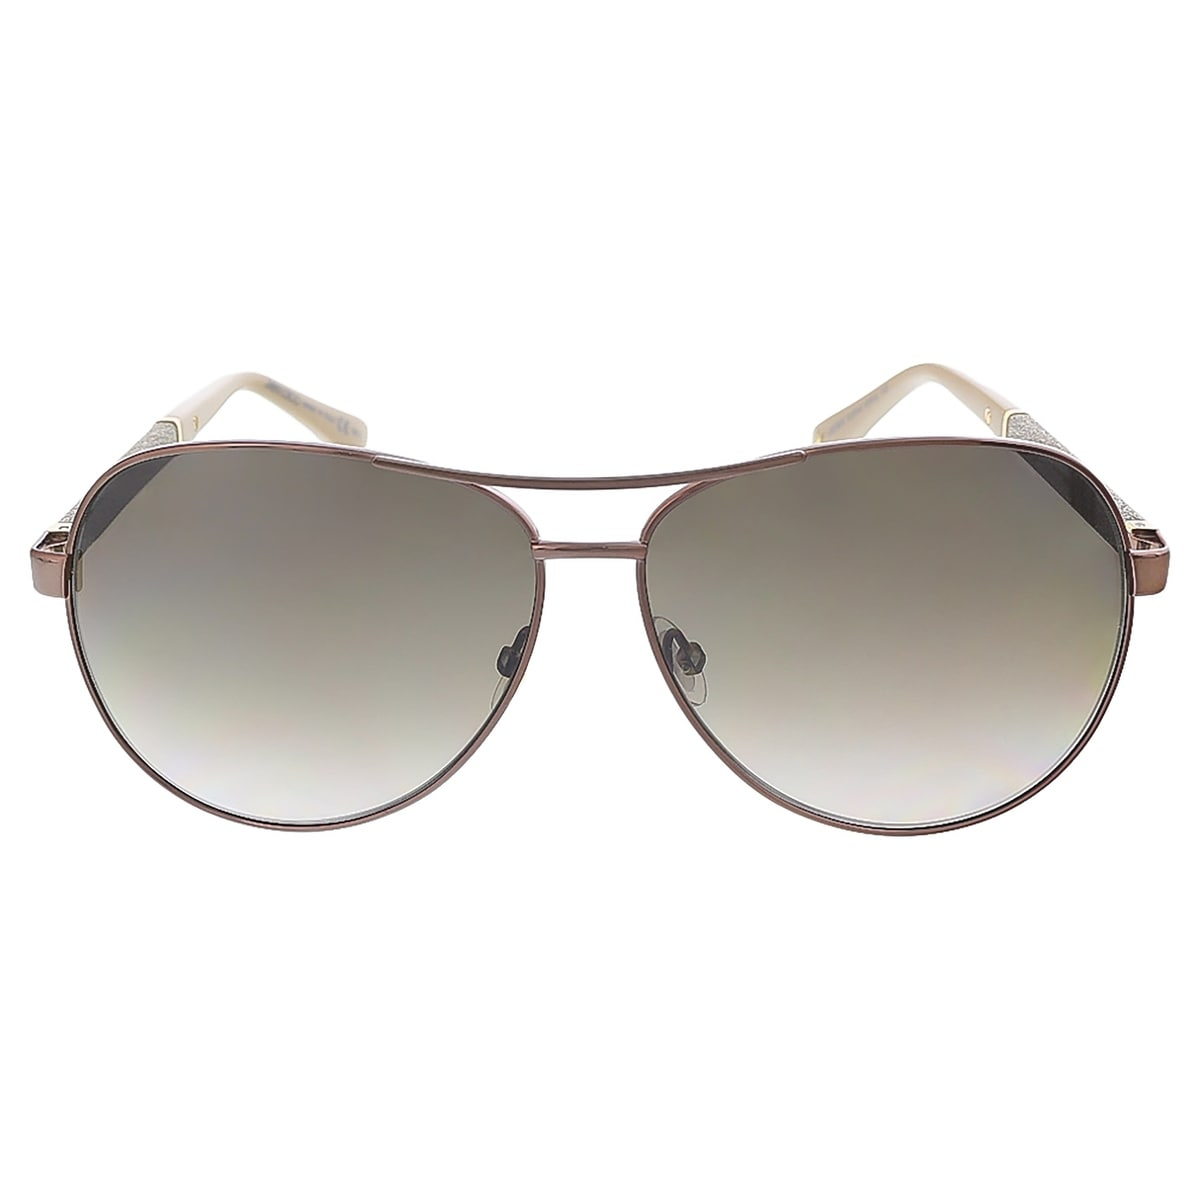 786f70e820 Shop Jimmy Choo LEXIE S 0EJW Bronze Aviator sunglasses - 61-12-135 - Free  Shipping Today - Overstock - 22253197